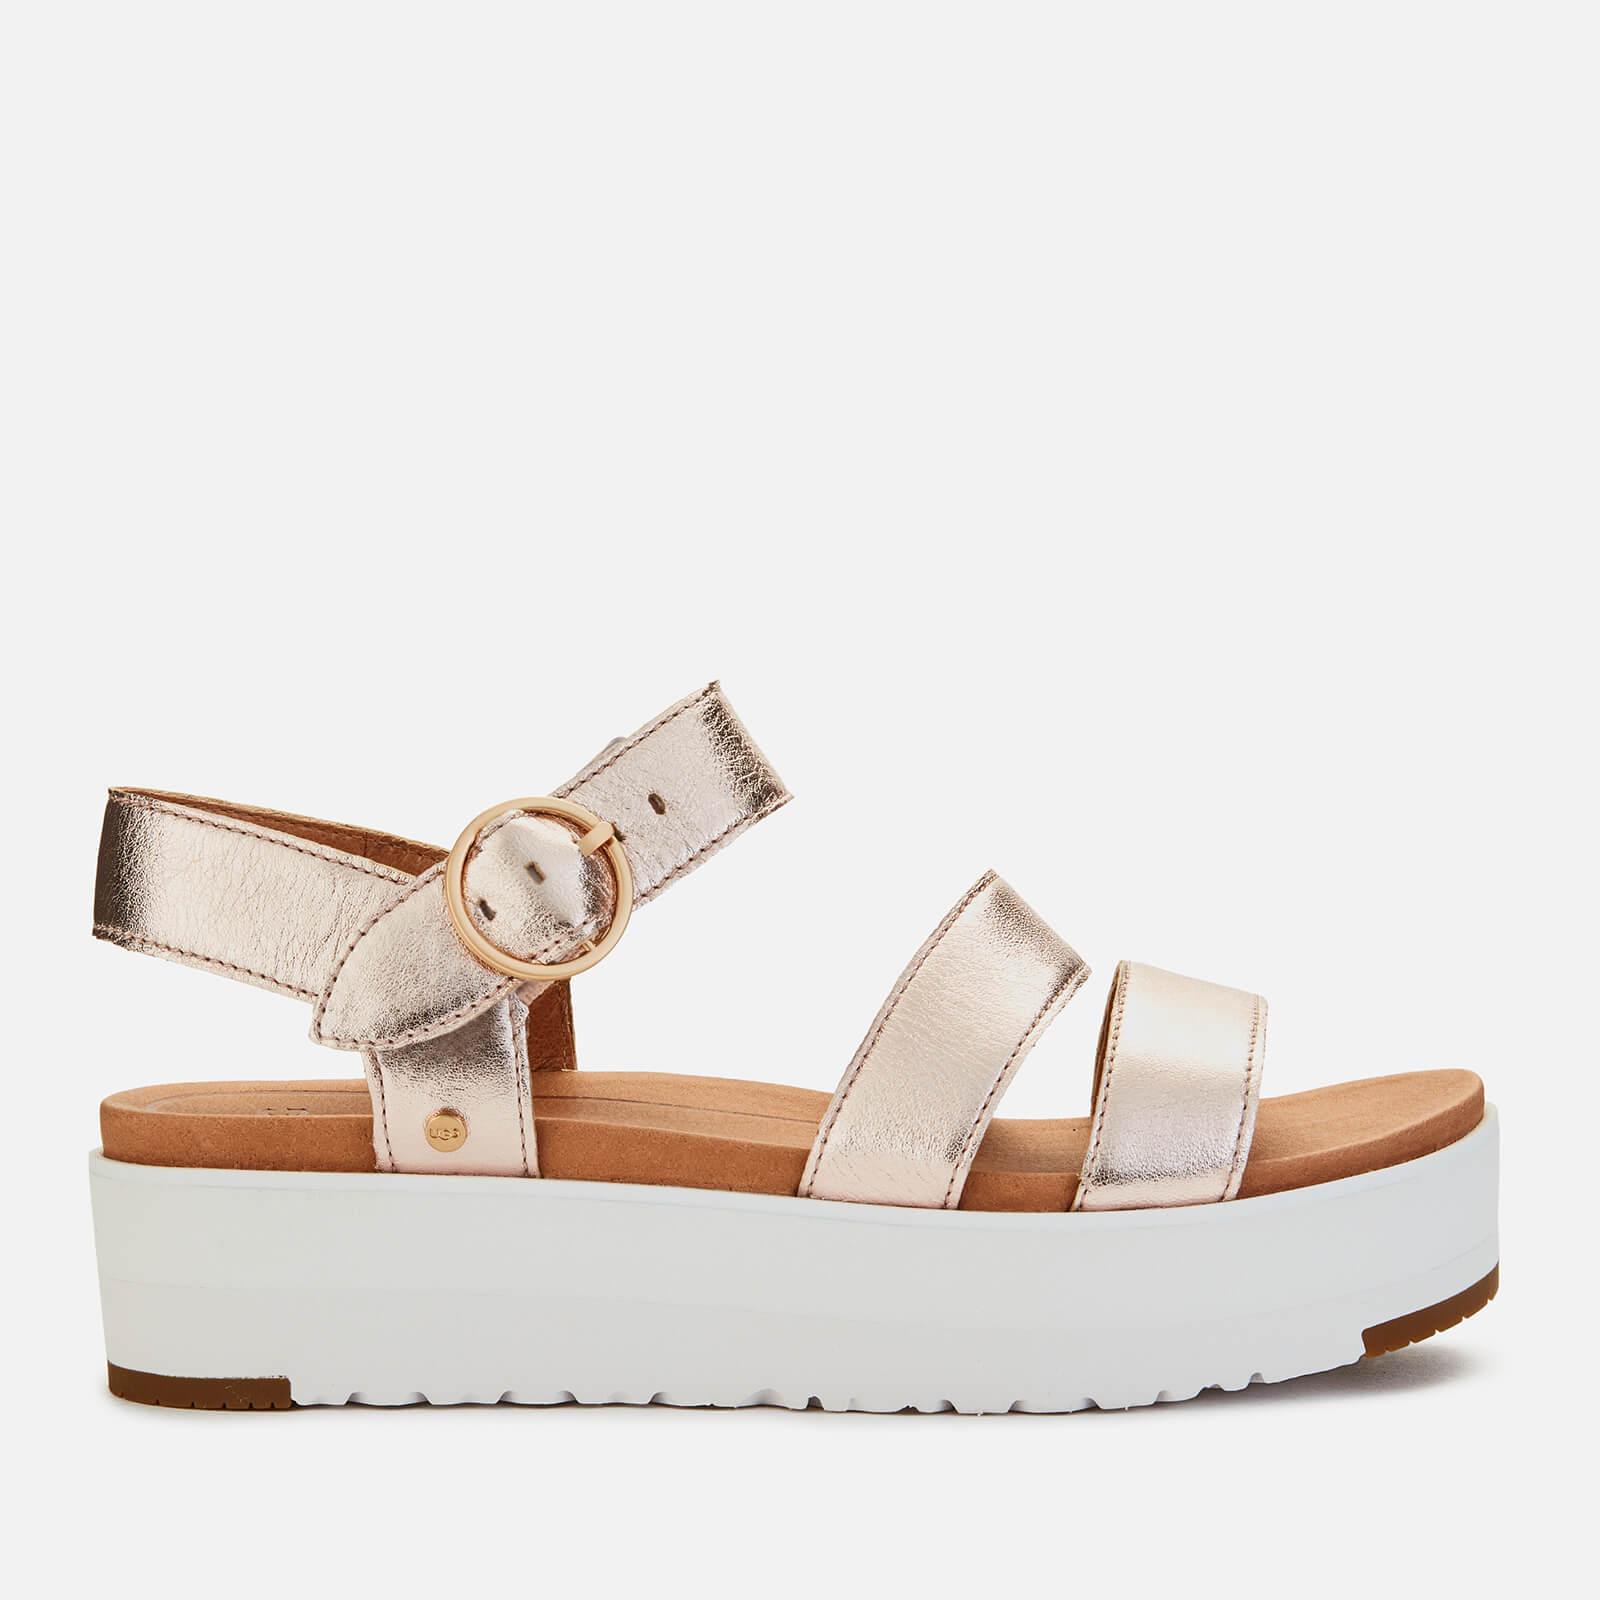 Ugg Women's Leedah Leather Flatform Sandals - Rose Gold Metallic - Uk 4